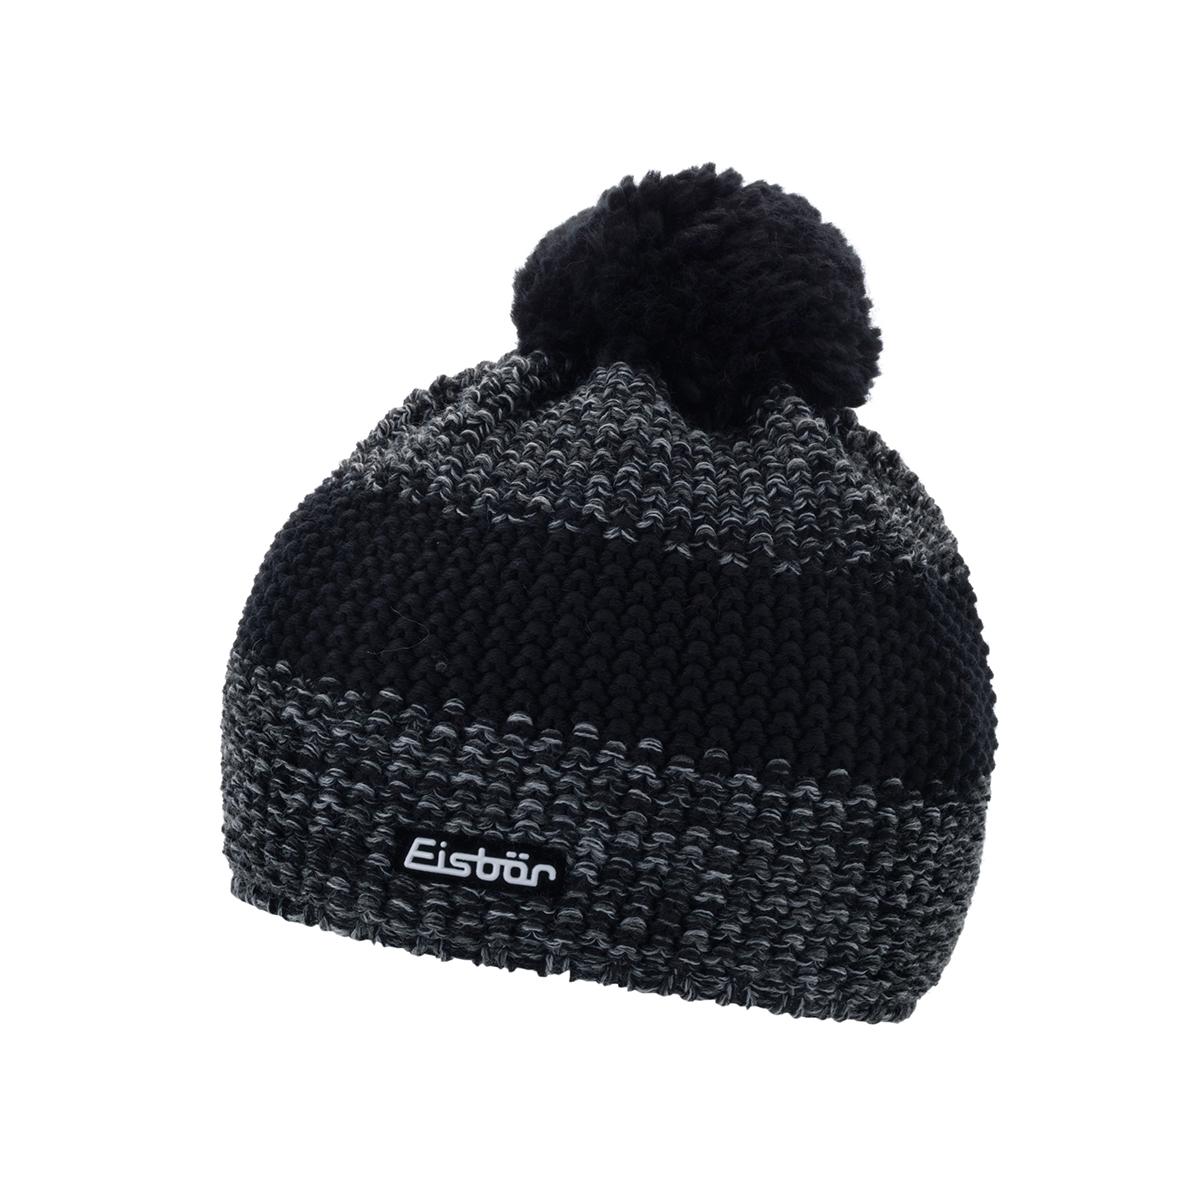 Eisbär Mütze Styler Pompon Fb.007